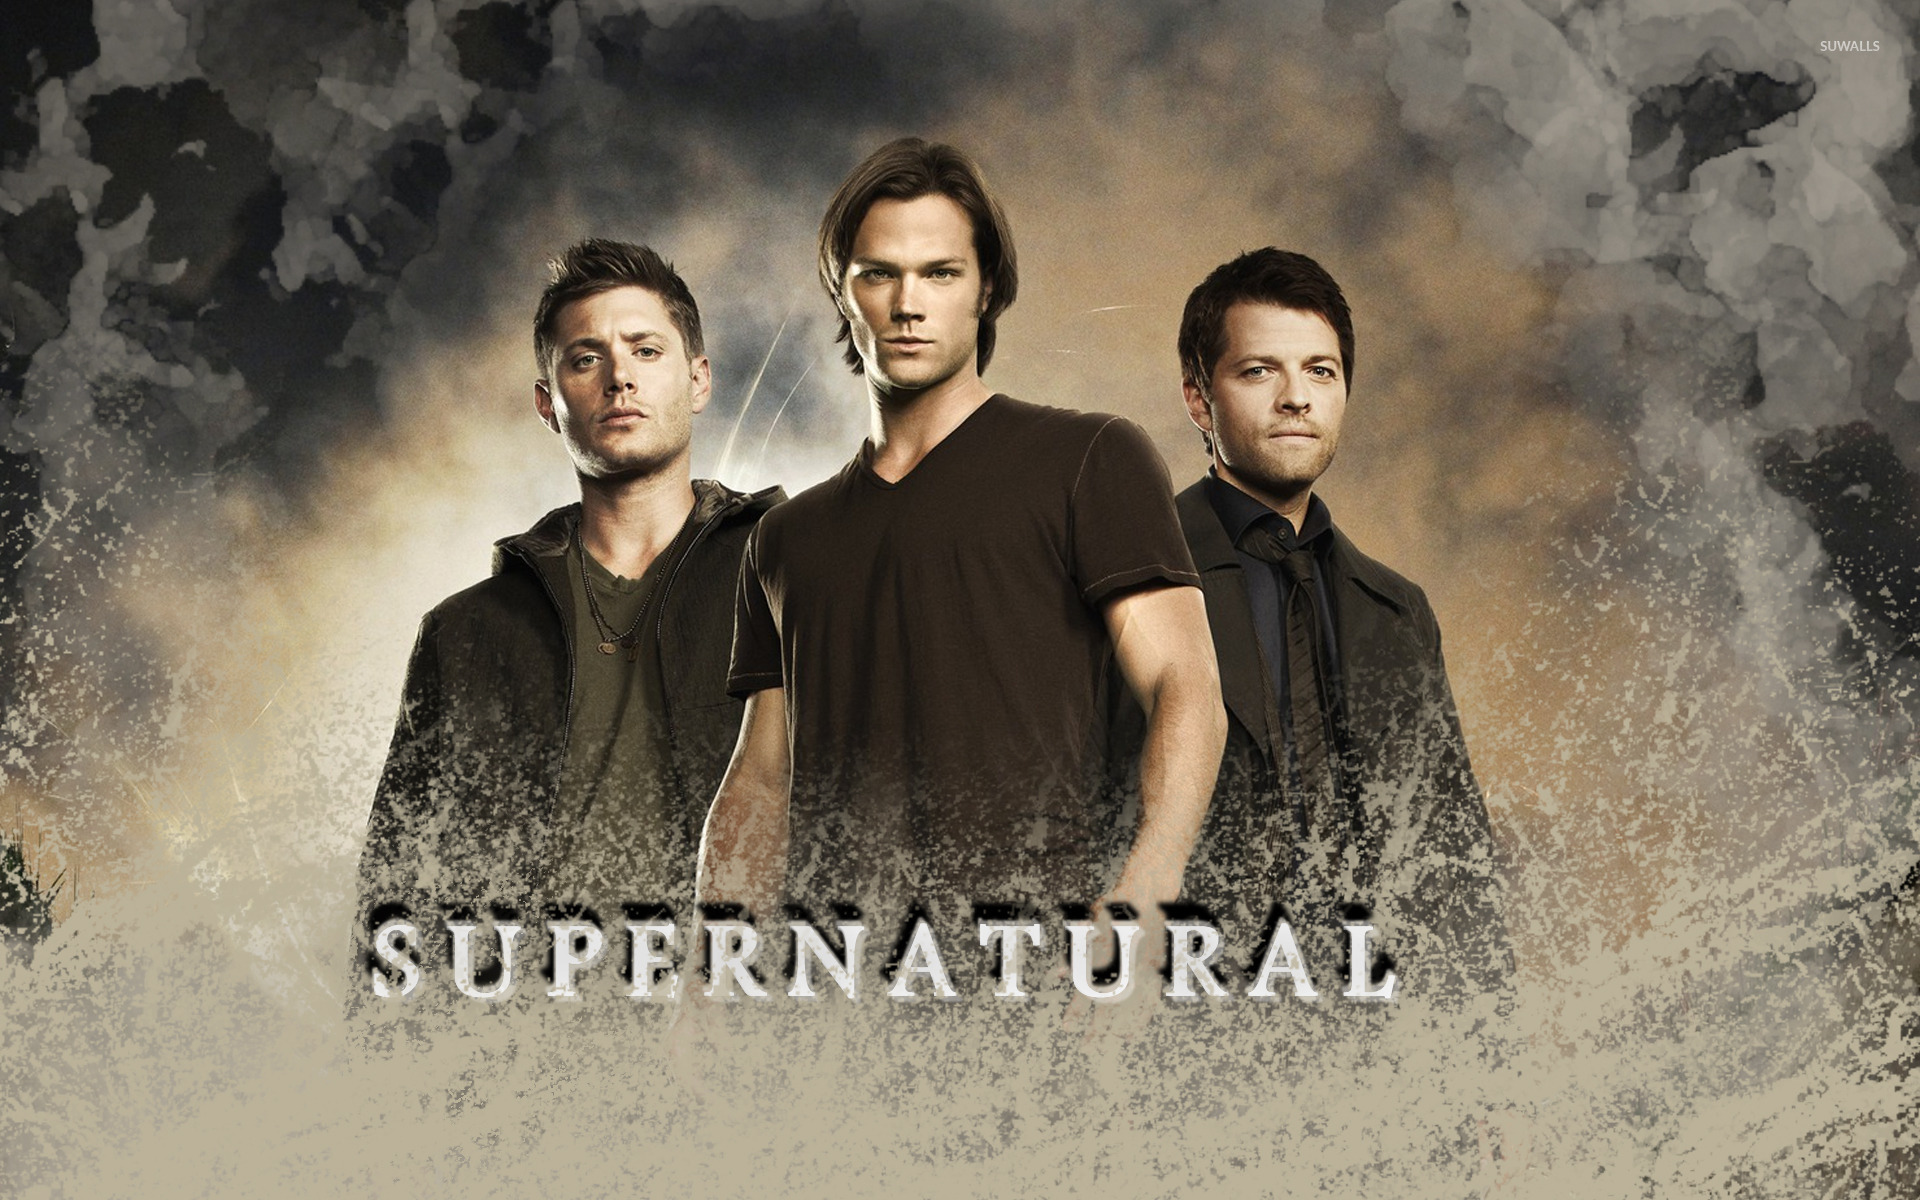 Supernatural 6 wallpaper tv show wallpapers 15098 supernatural 6 wallpaper voltagebd Image collections